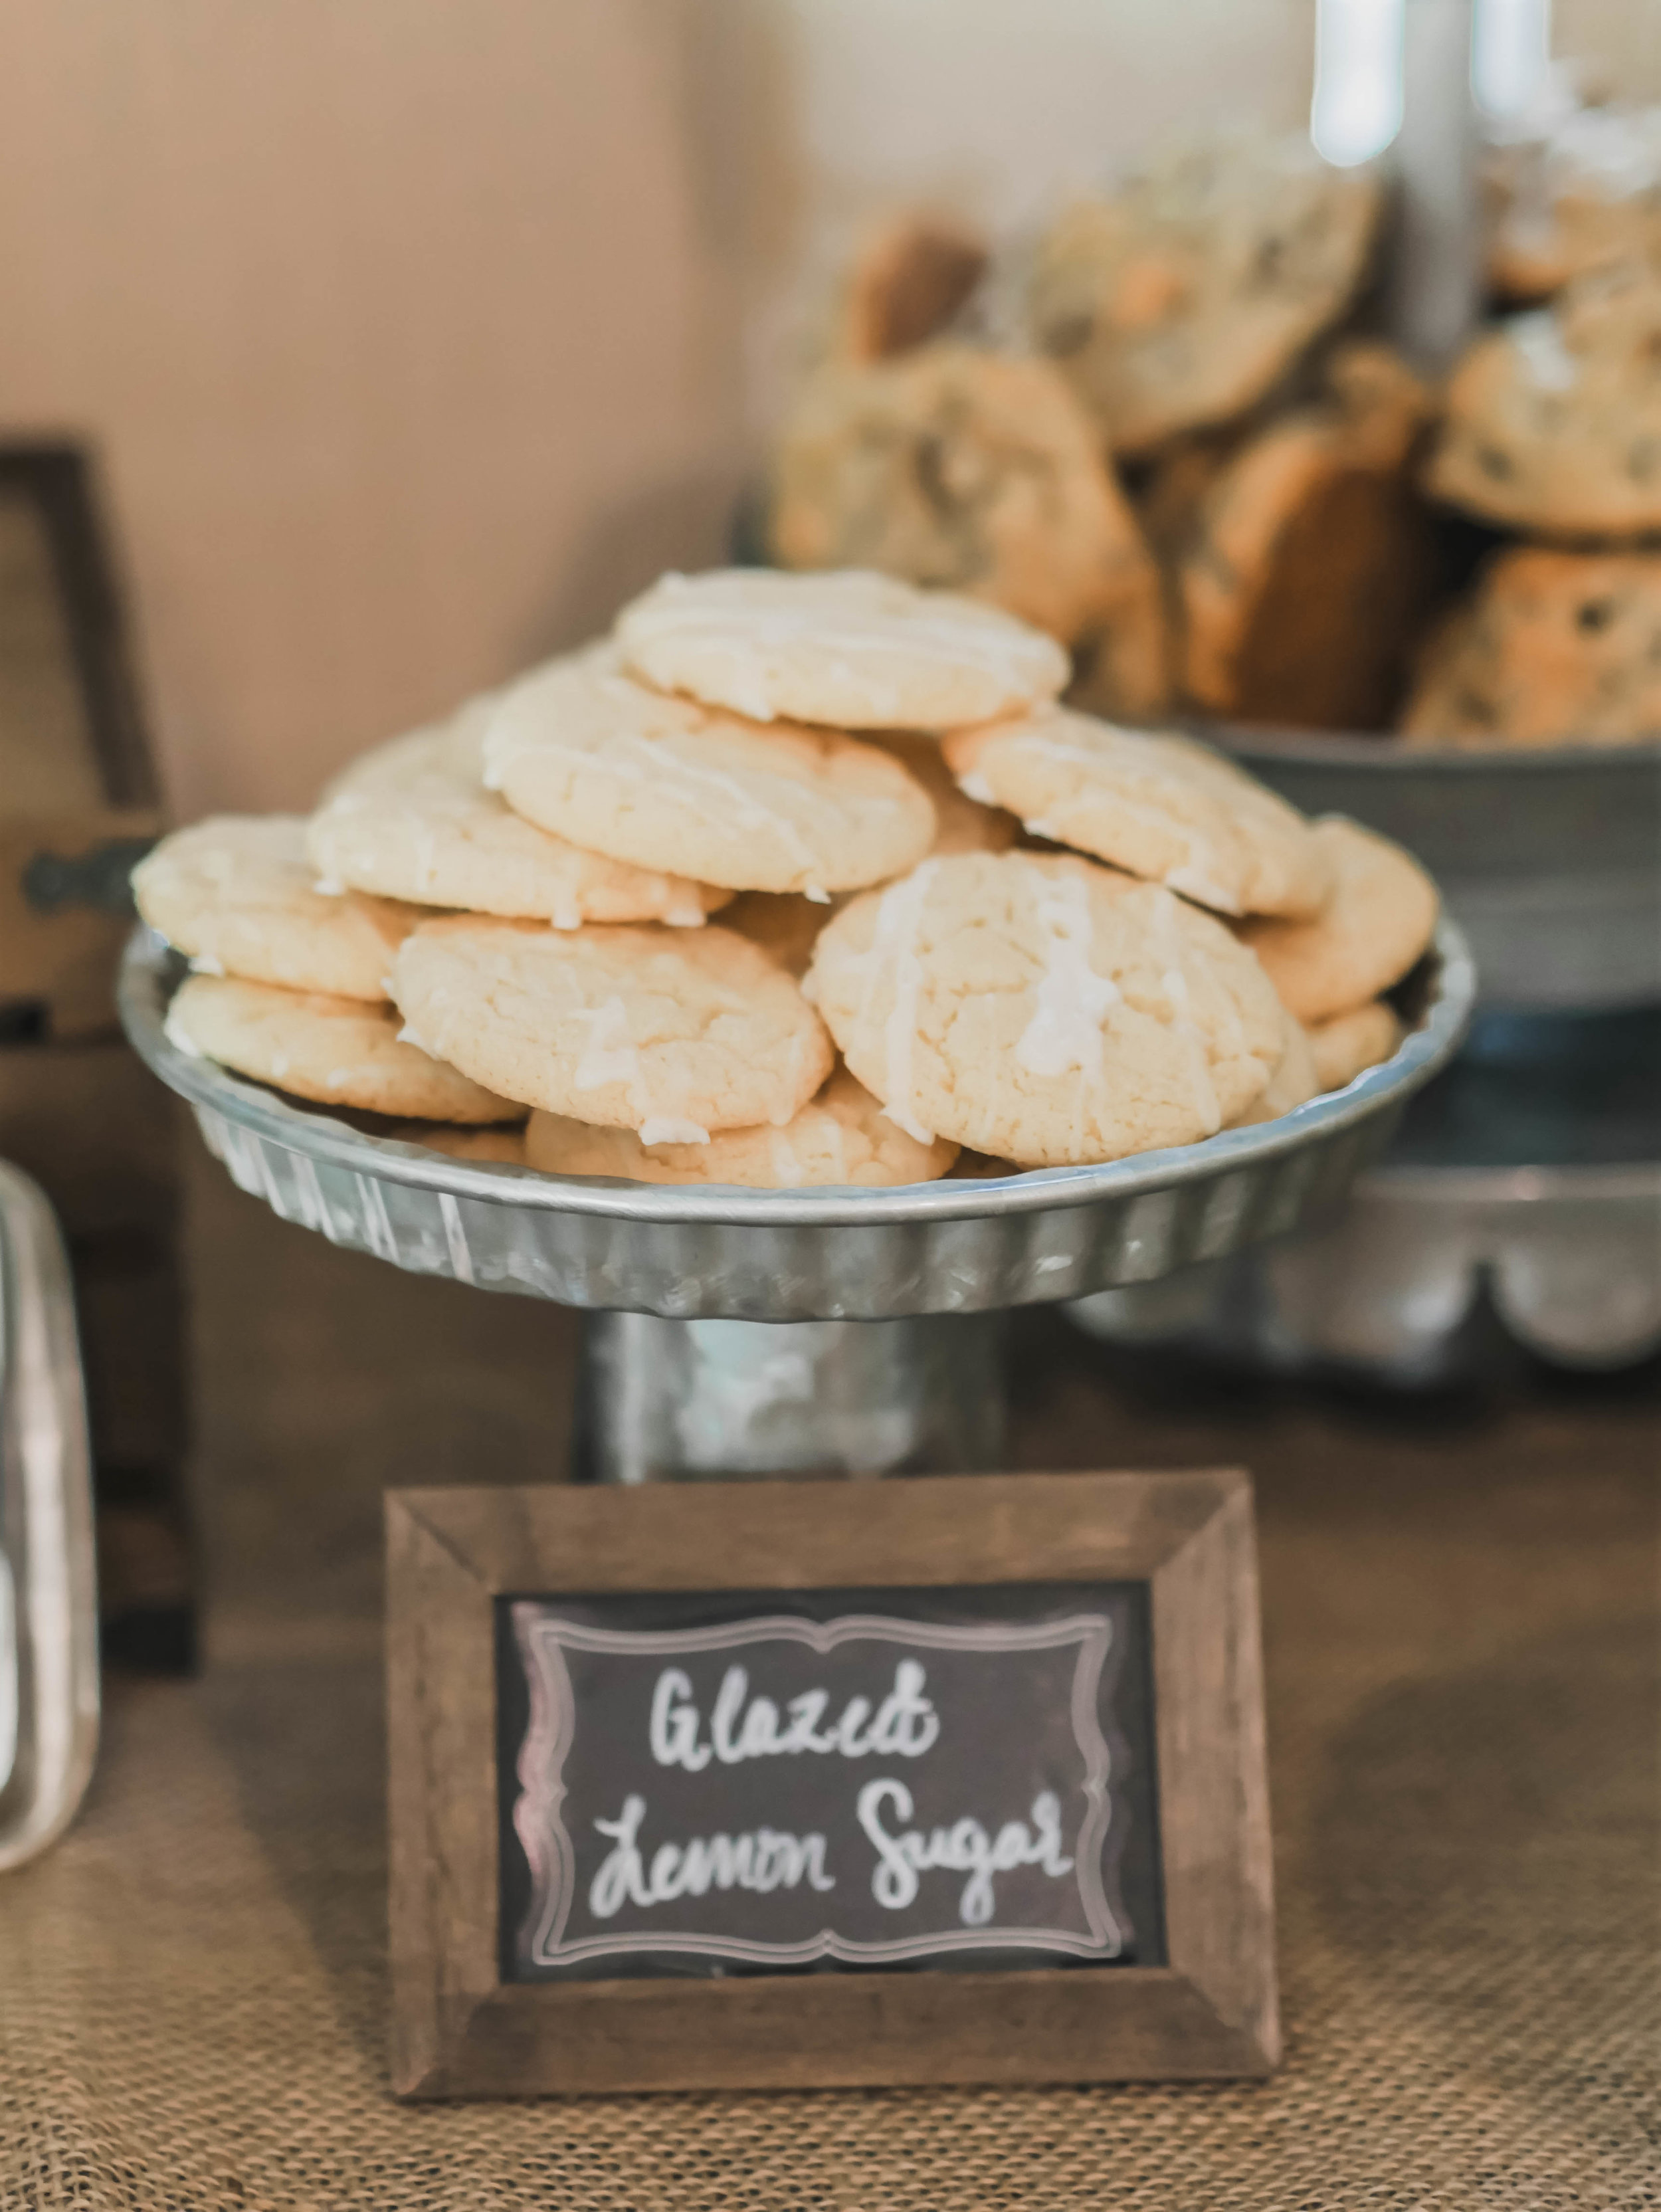 Glazed lemon sugar cookies from a Cookie Bar - as seen on Mint Event Design www.minteventdesign.com